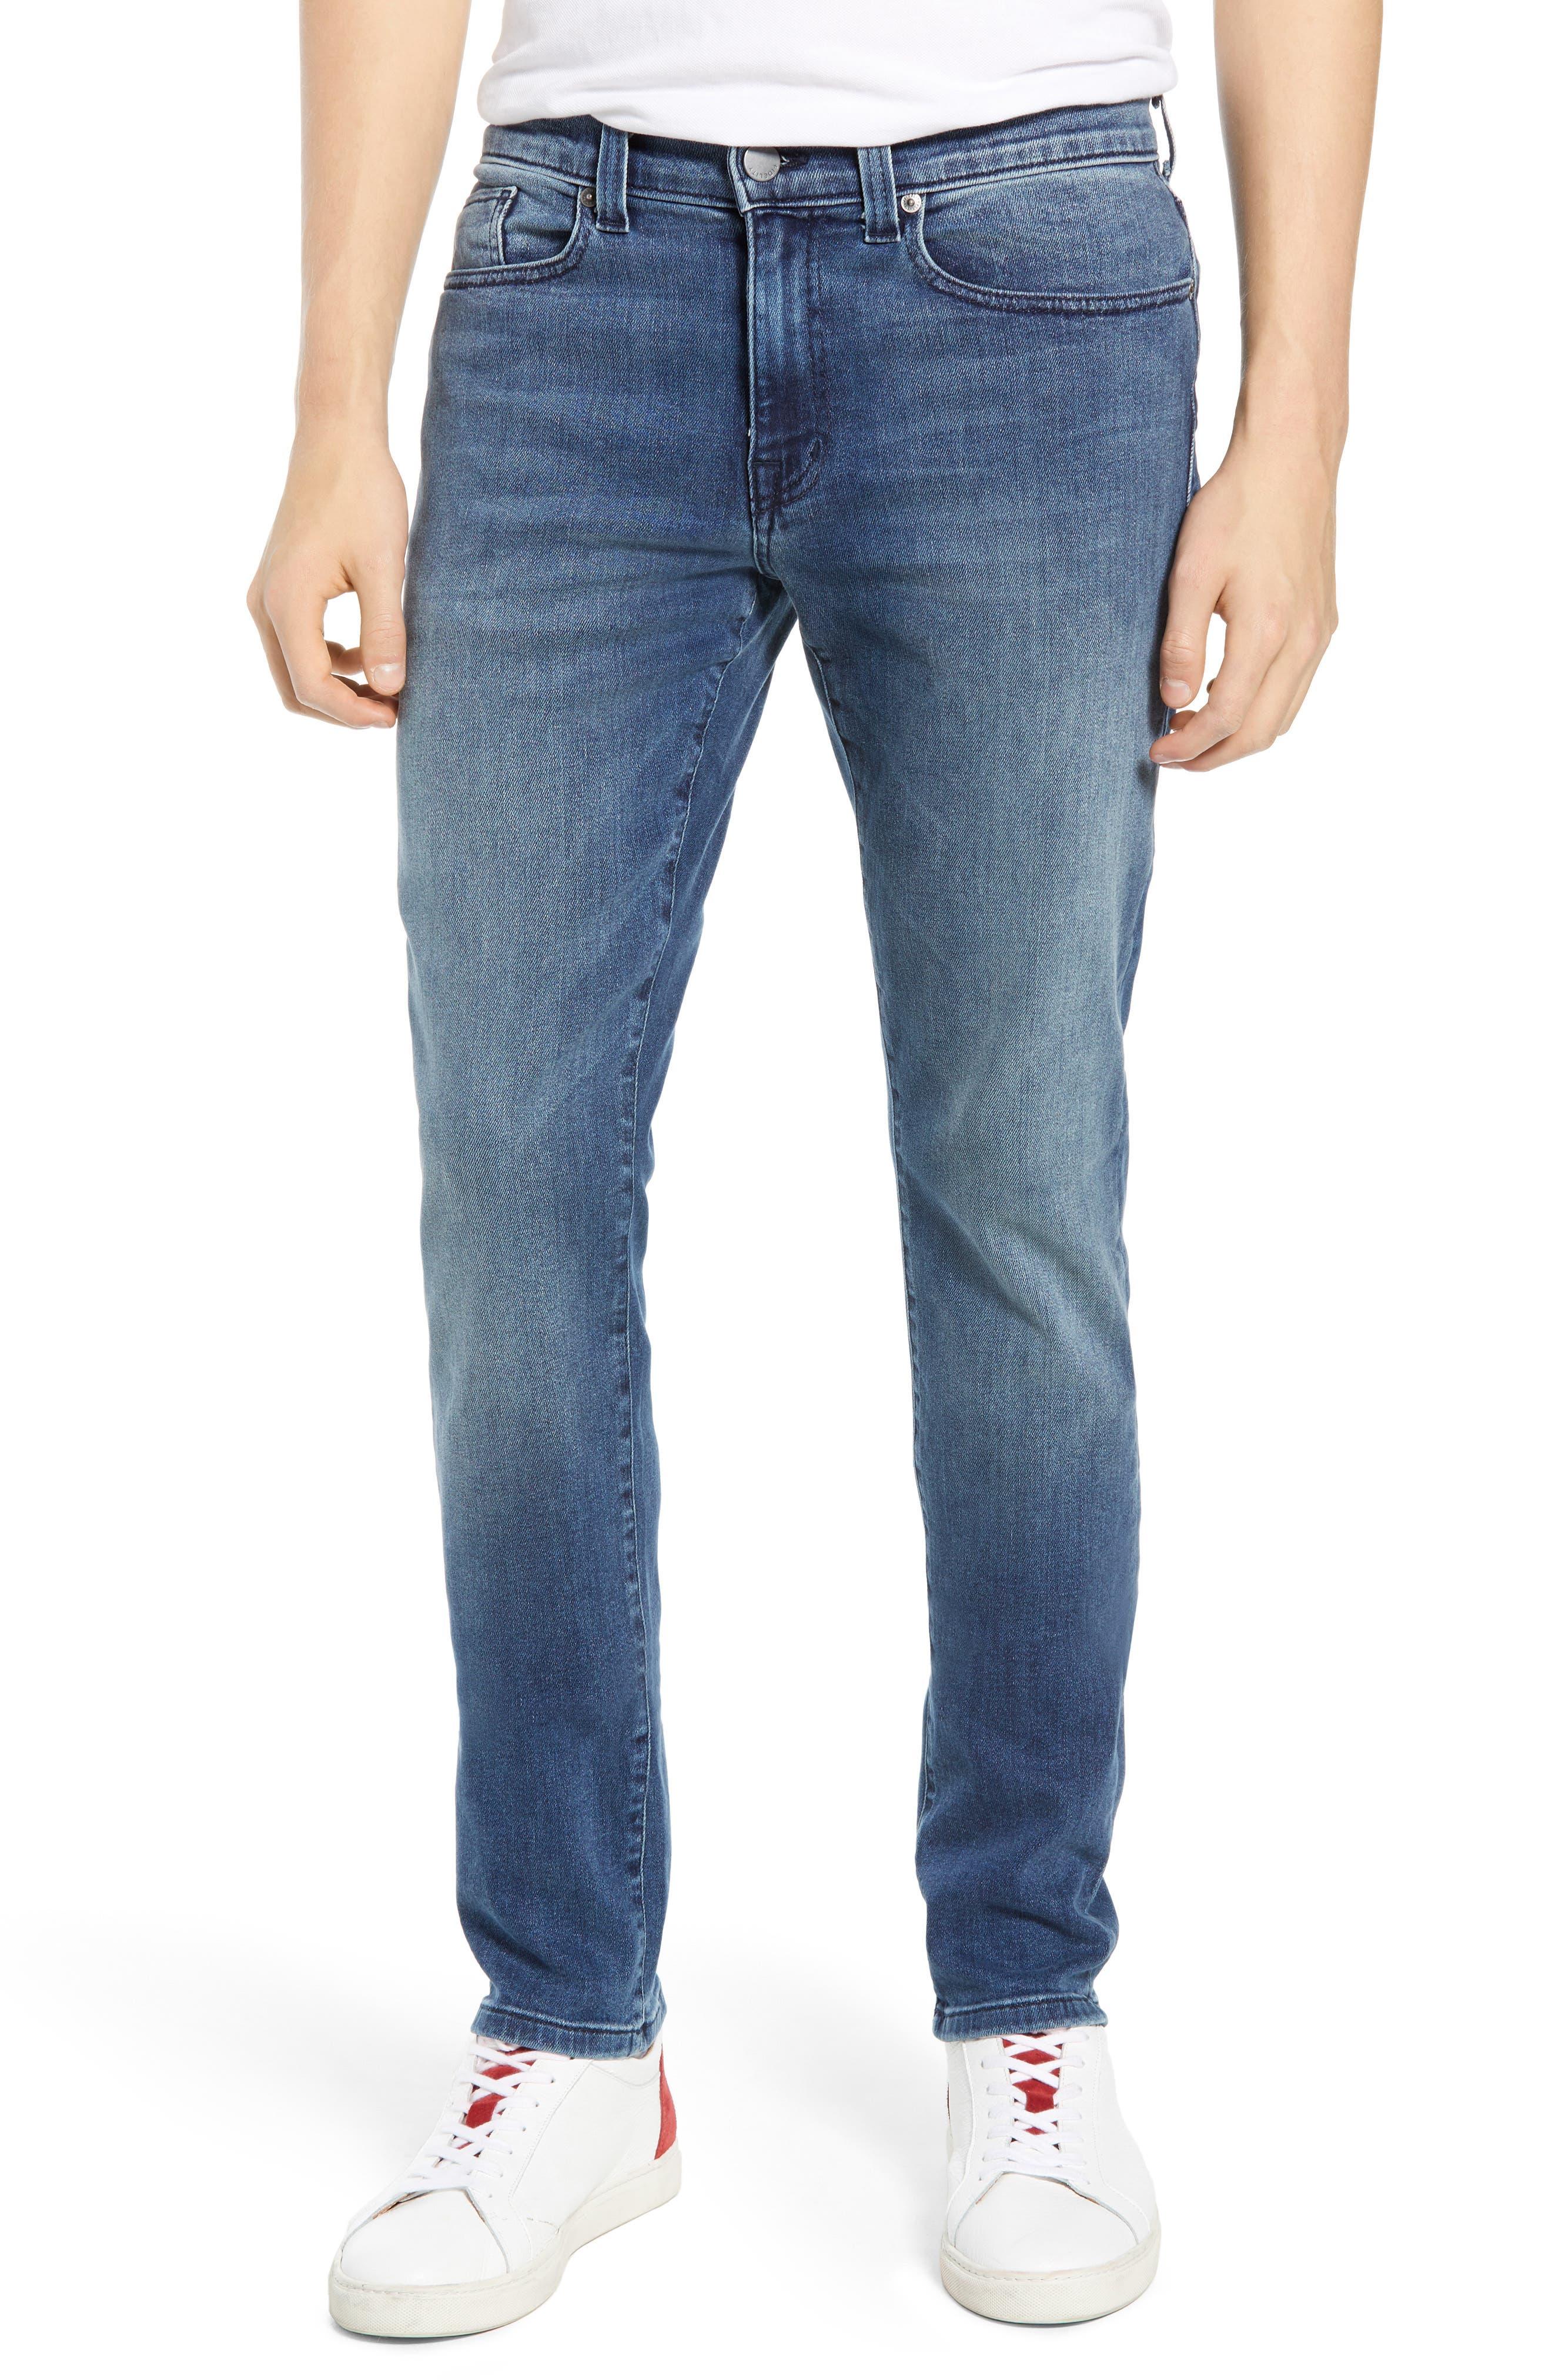 Torino Slim Fit Jeans,                         Main,                         color, EMPIRE BLUE